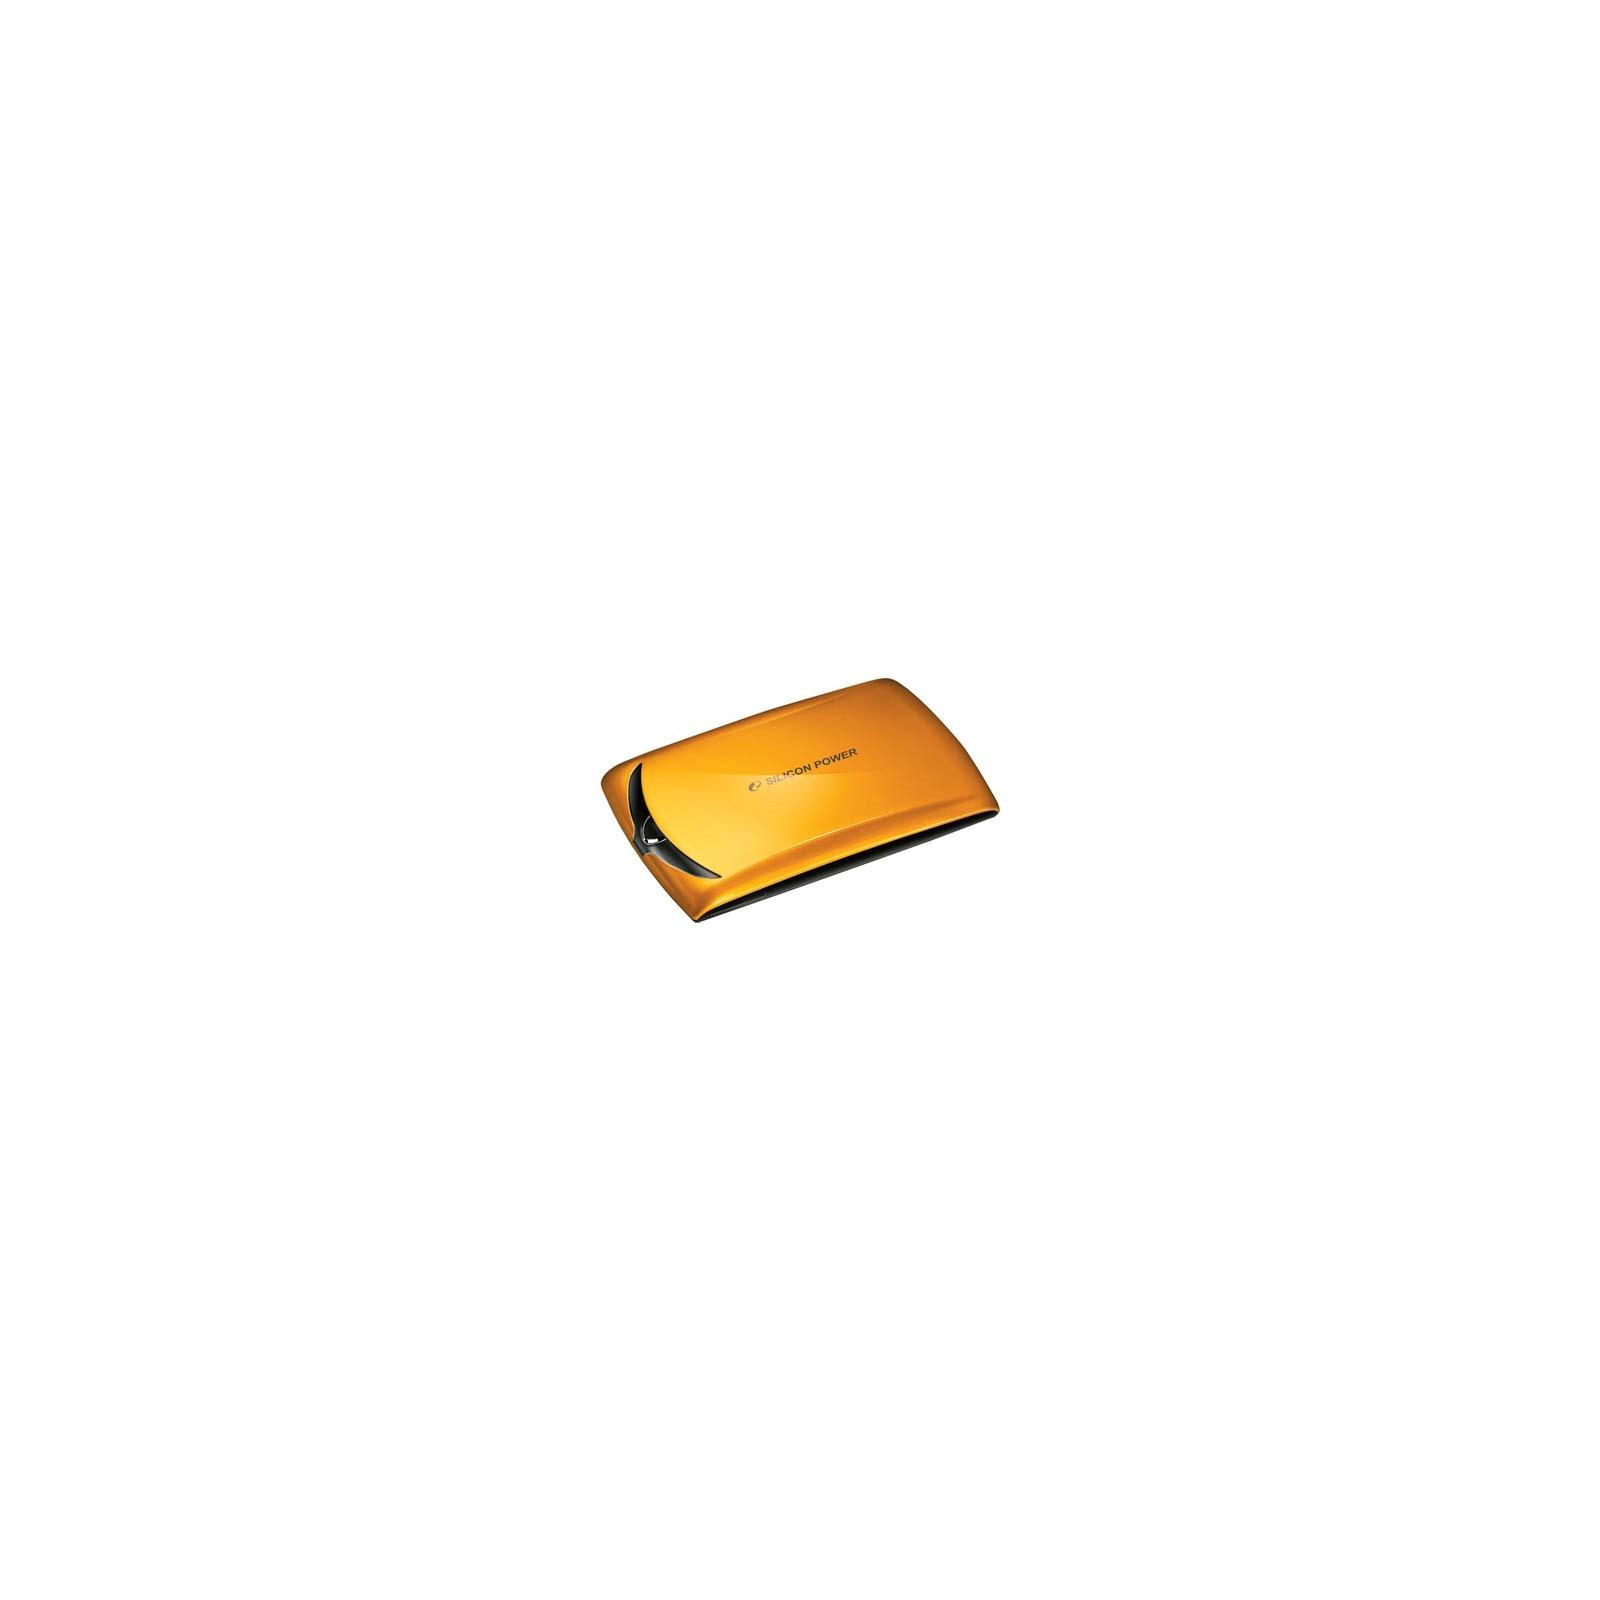 "Внешний жесткий диск 2.5"" 1TB Silicon Power (SP010TBPHDS10S3O)"